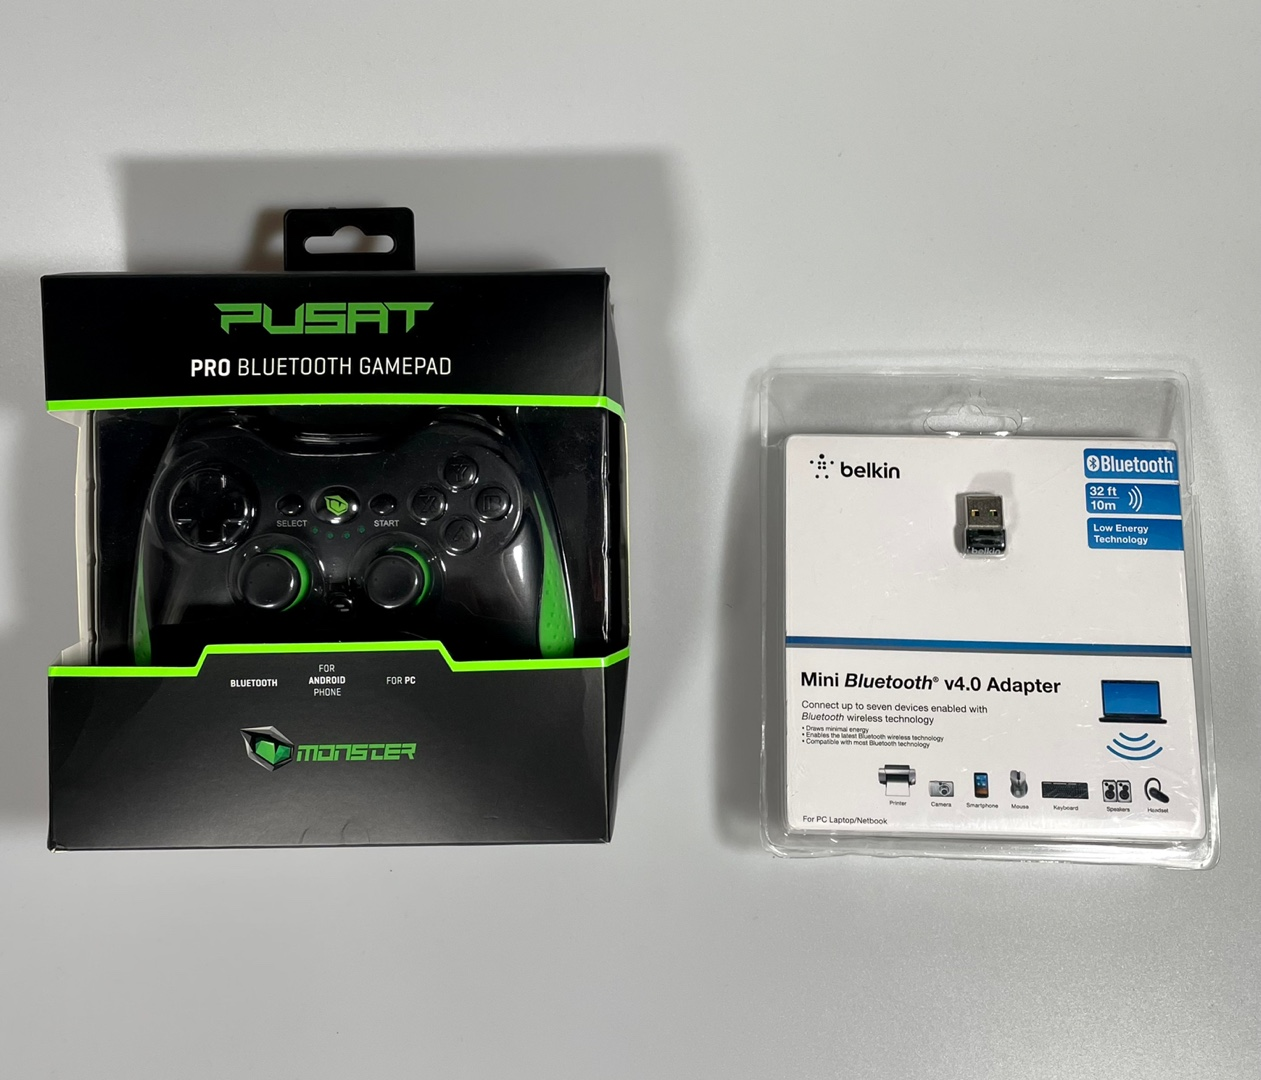 Monster Pusat Pro & Belkin Bluetooth (Garantili)